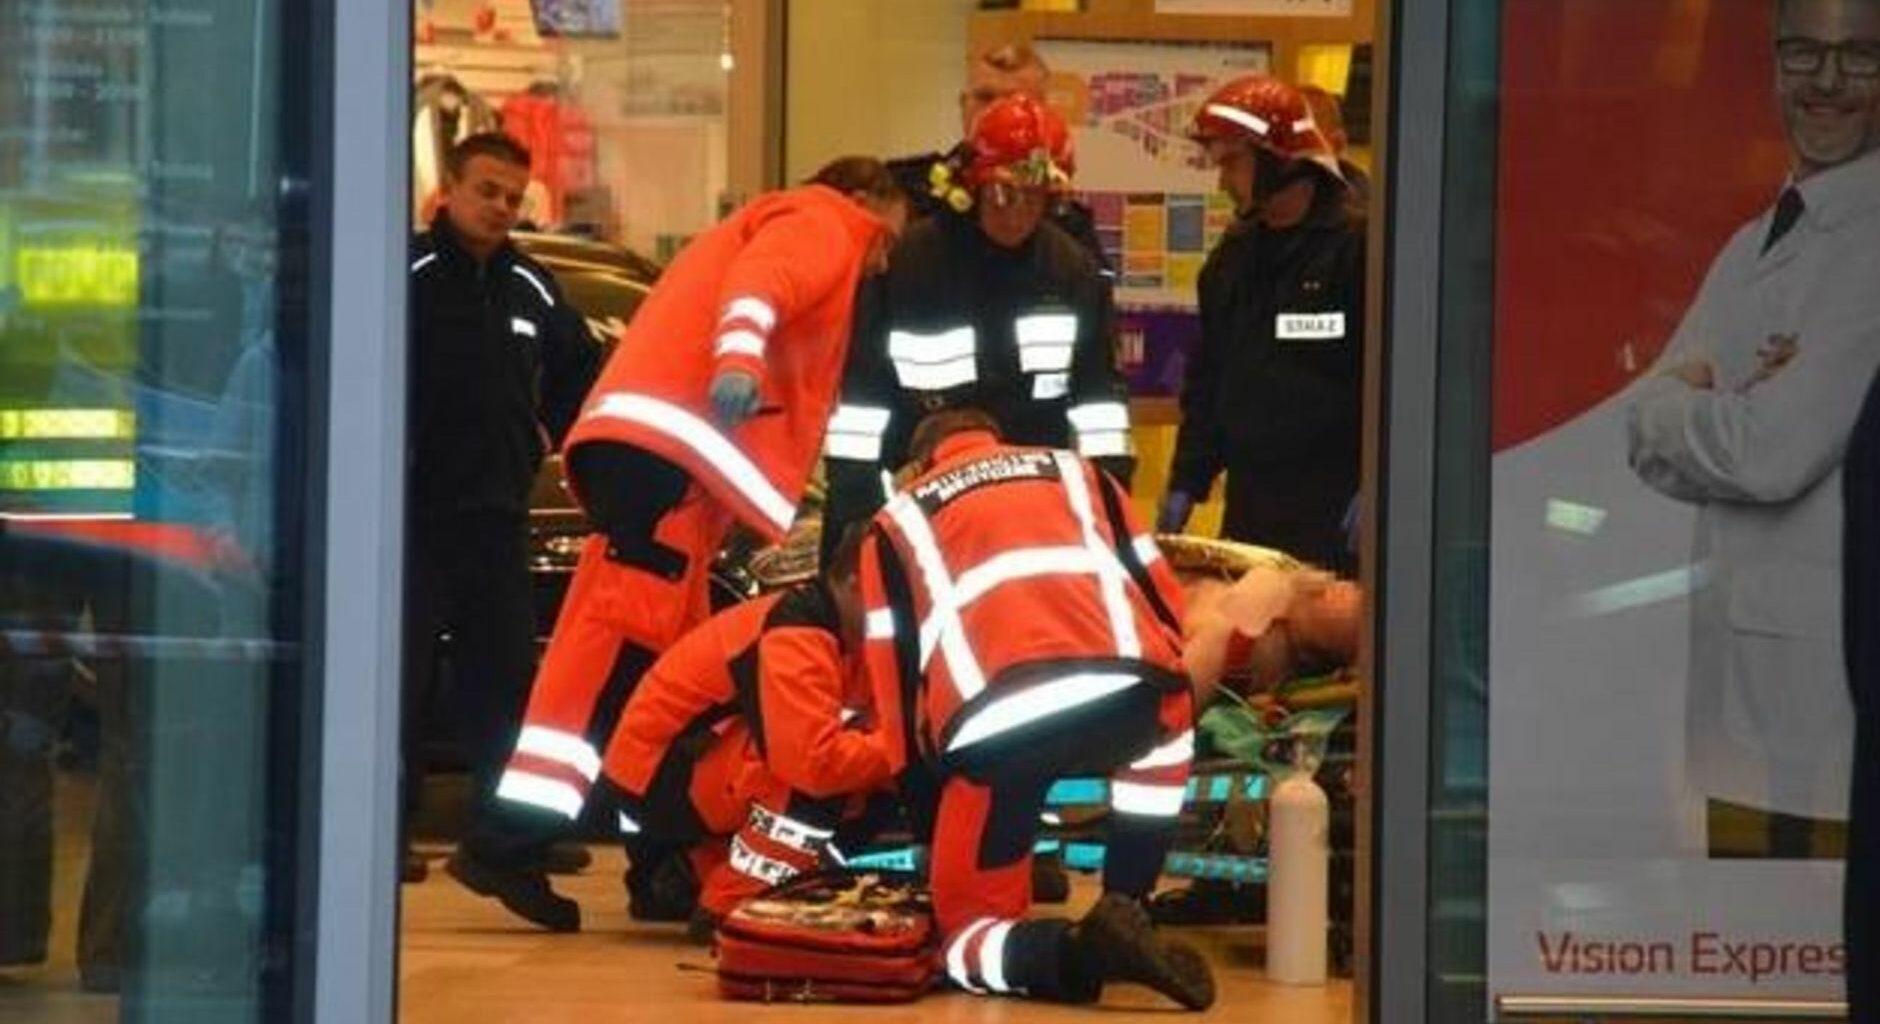 Poland shopping mall attack